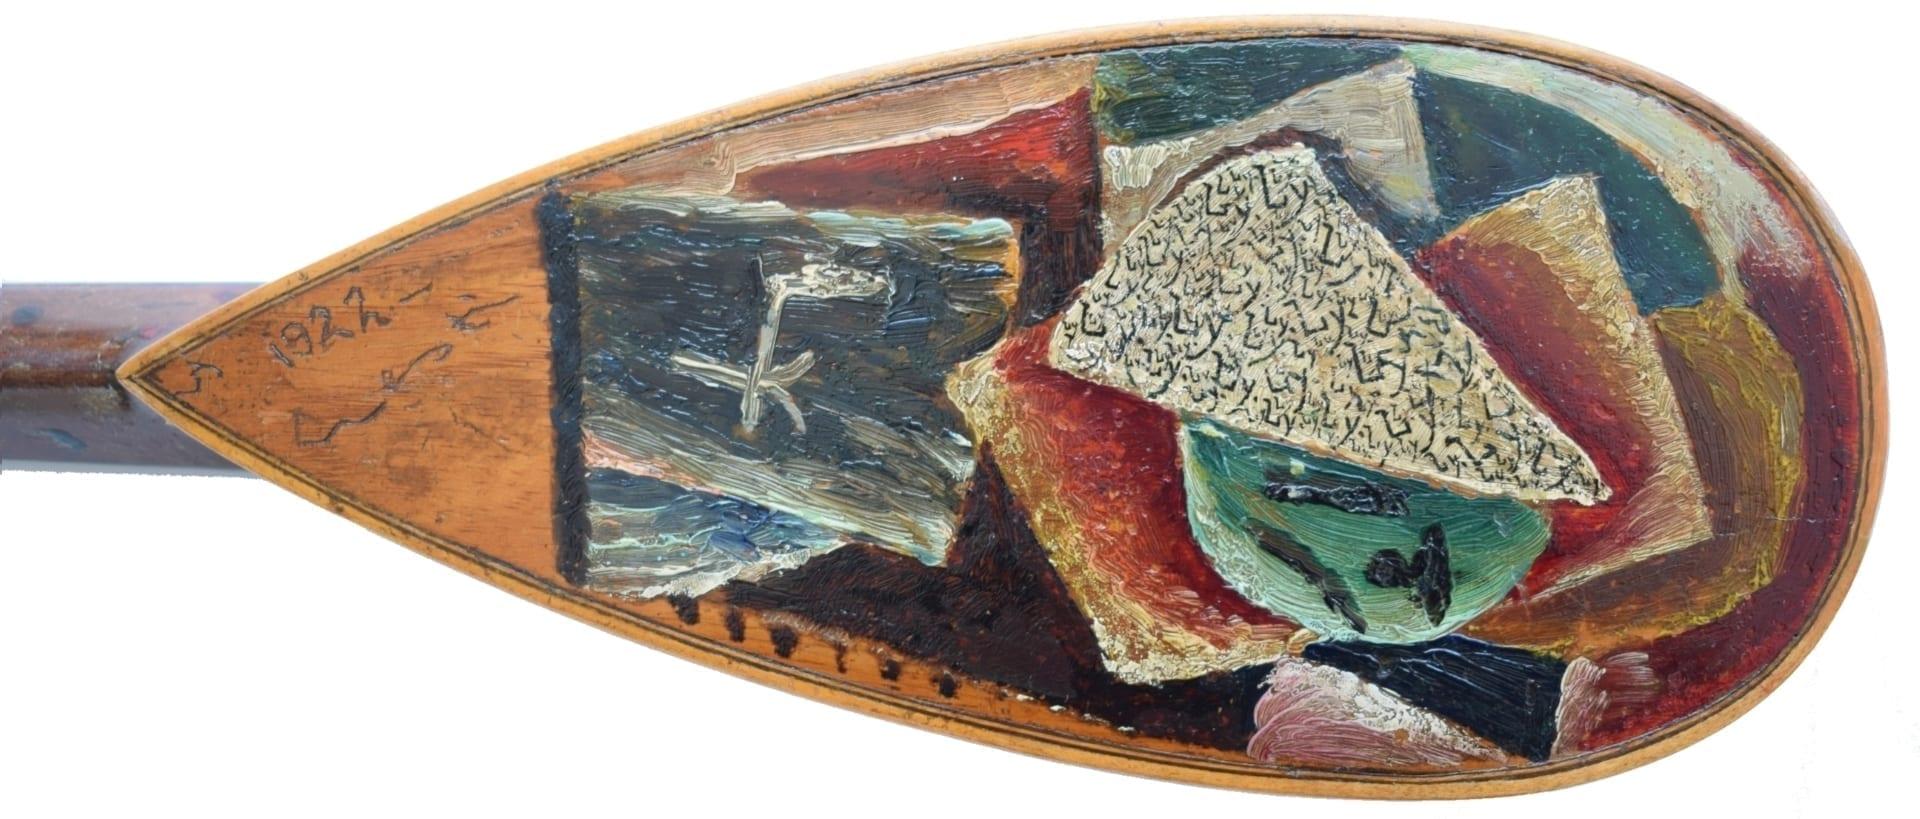 Galeria DADA Victor Brauner - Mandolina 1922